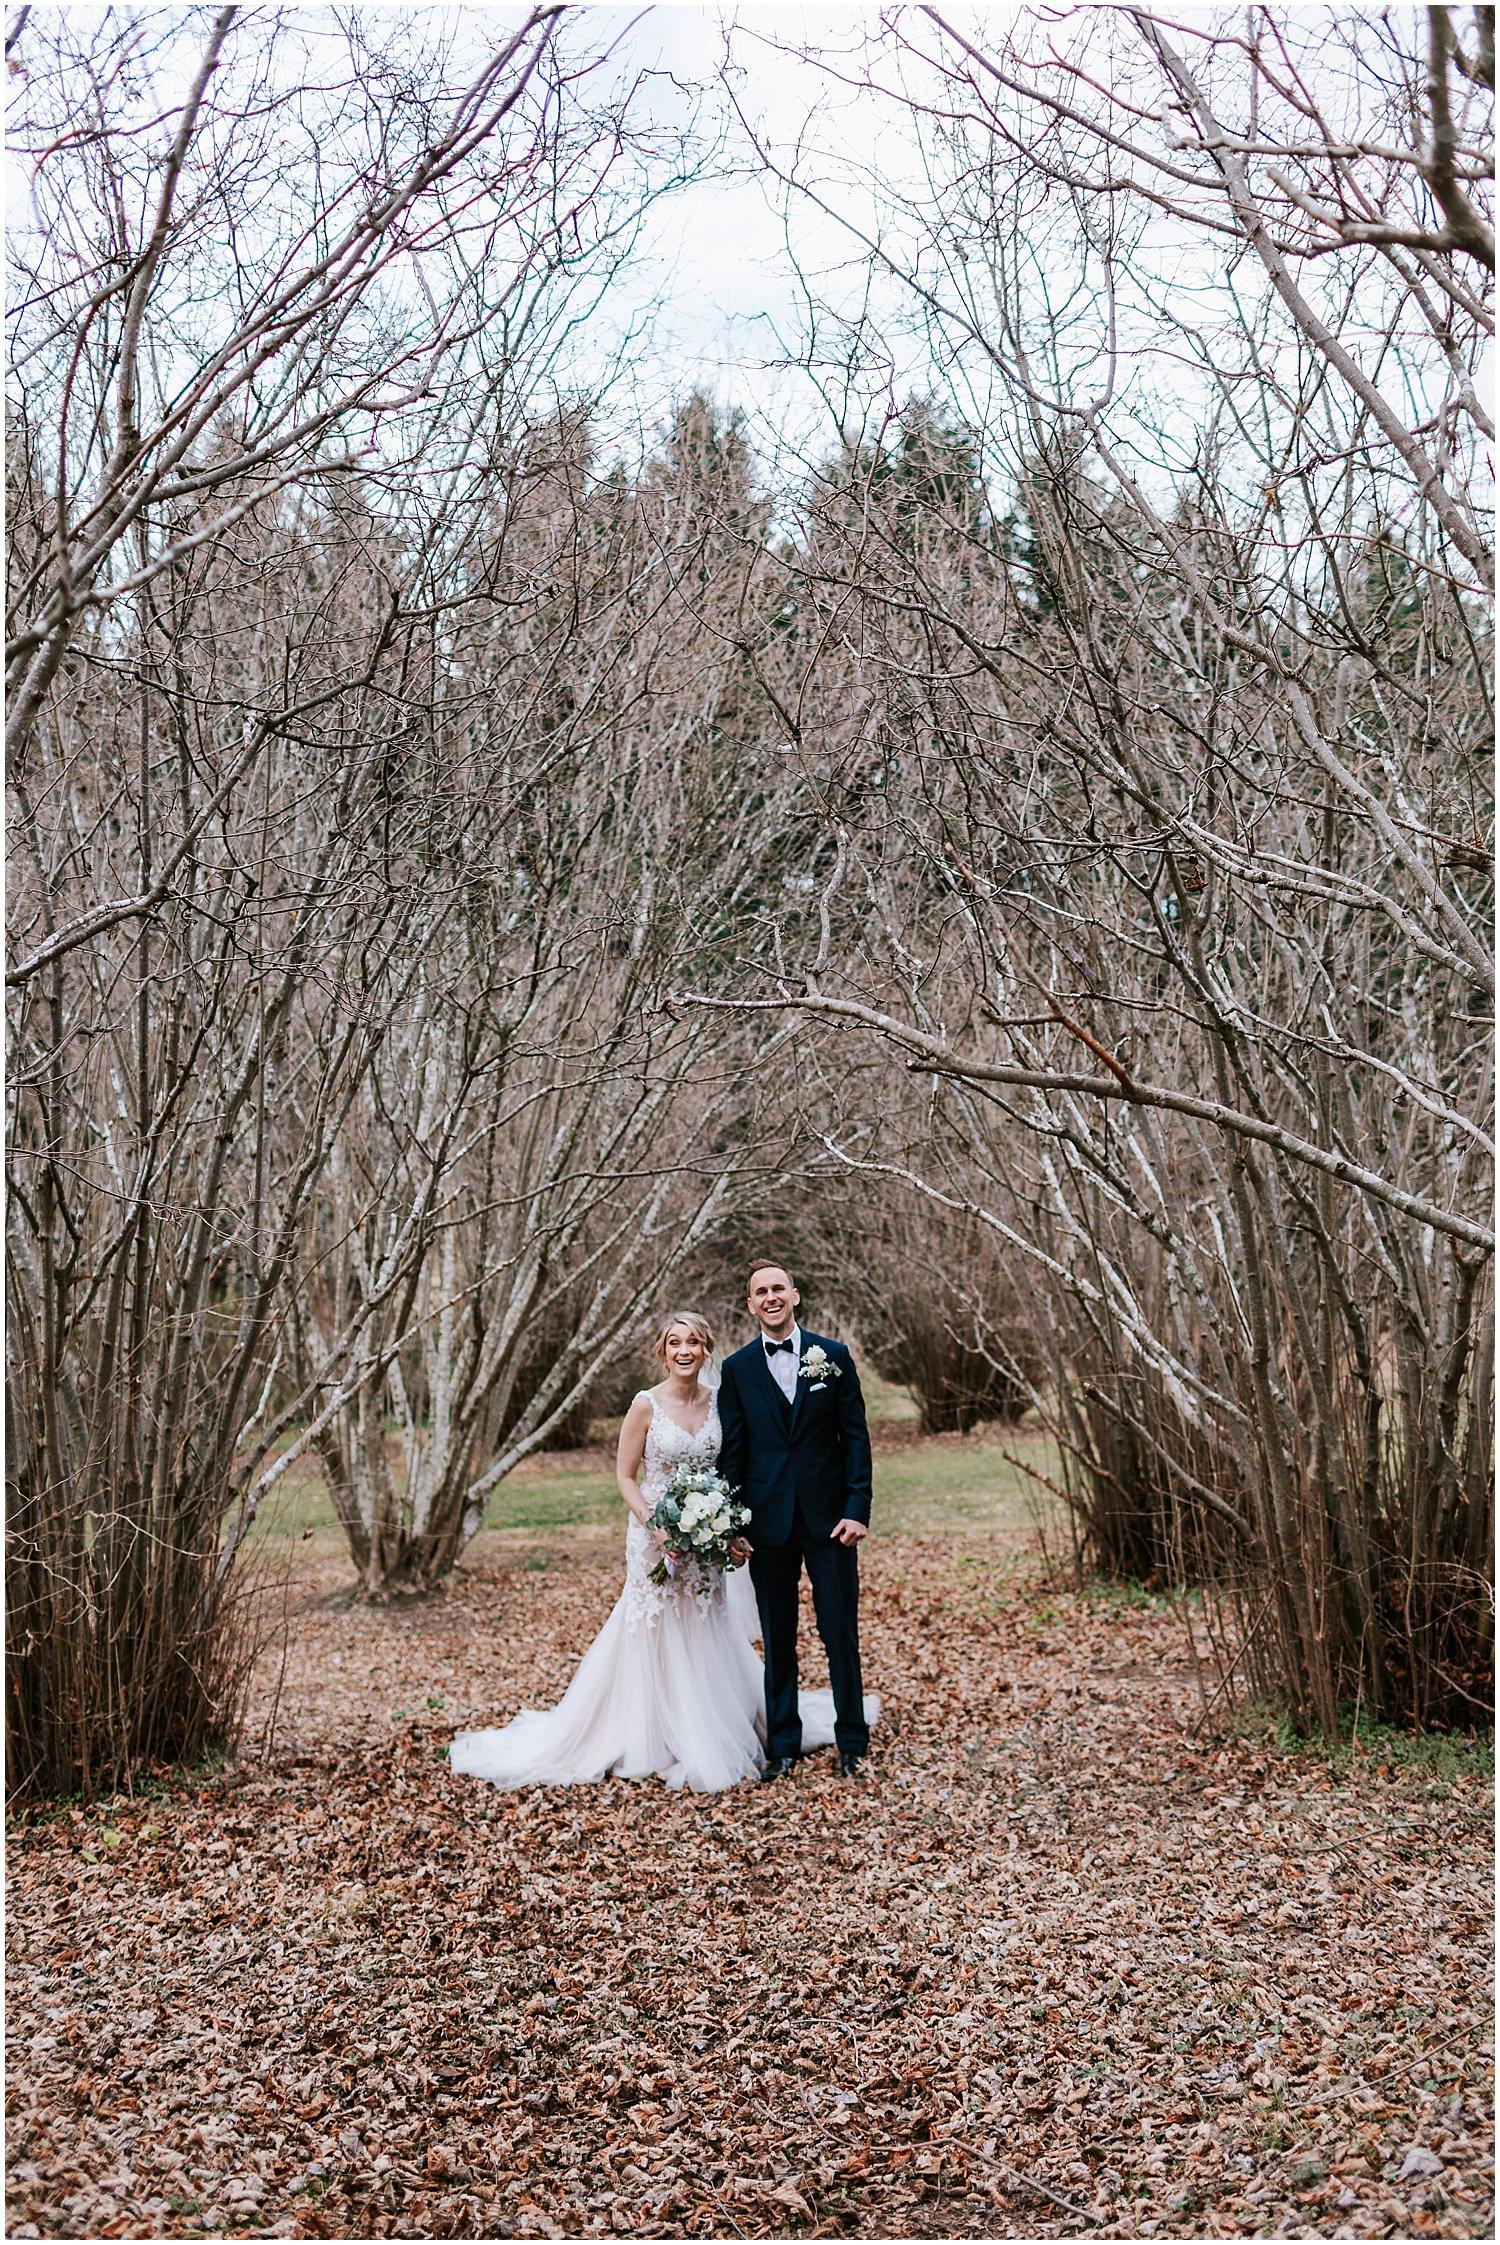 dominique-guy-montrose-berry-farm-wedding-_0049.jpg